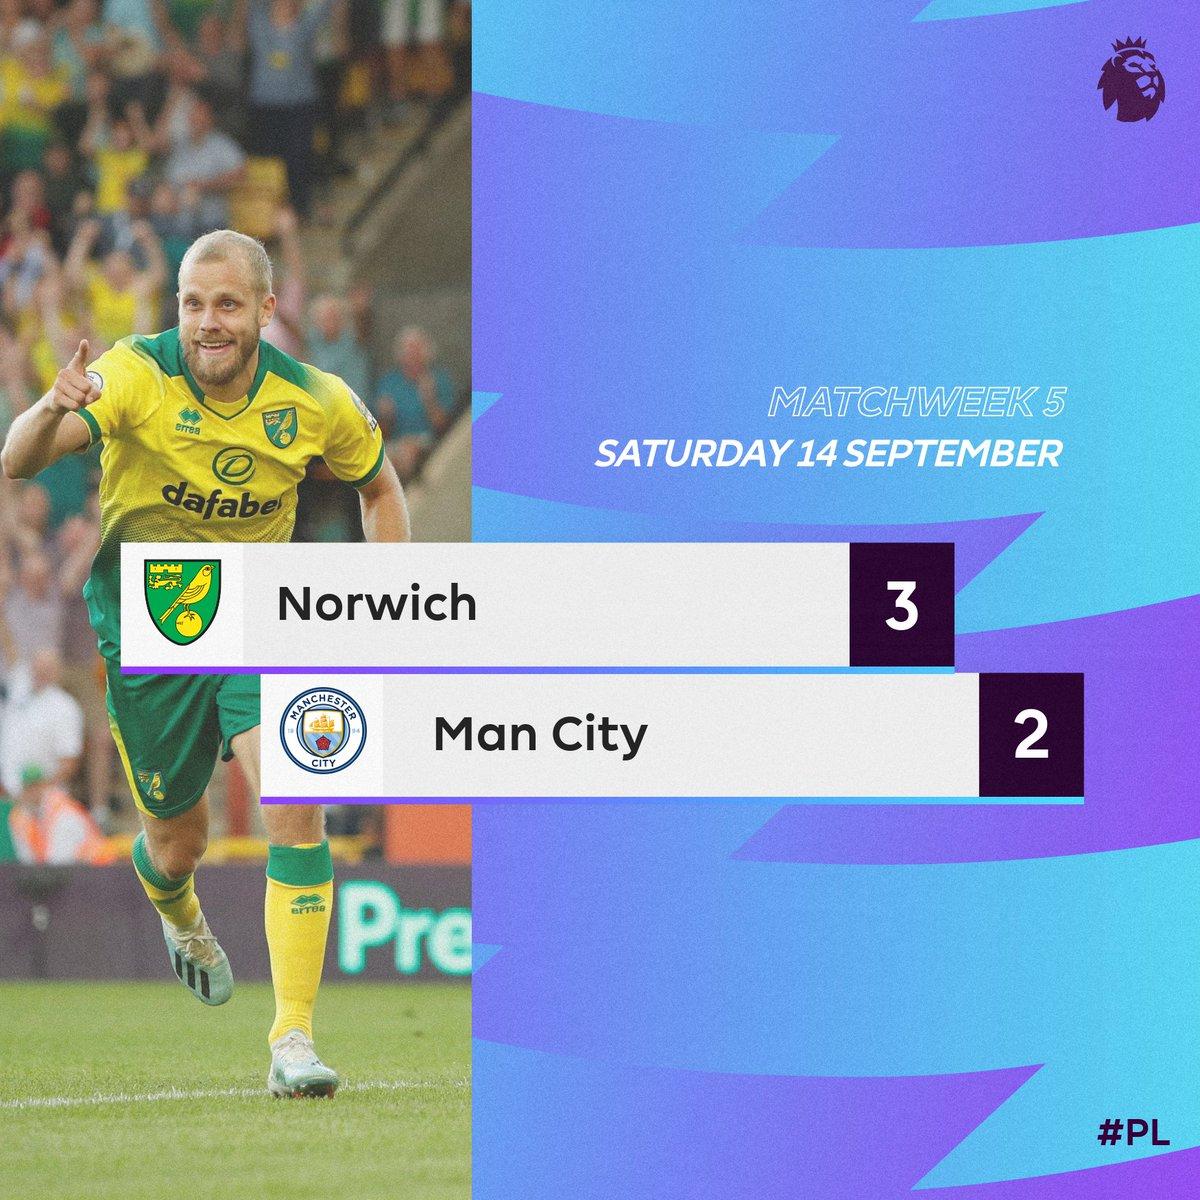 Norwich-Man City